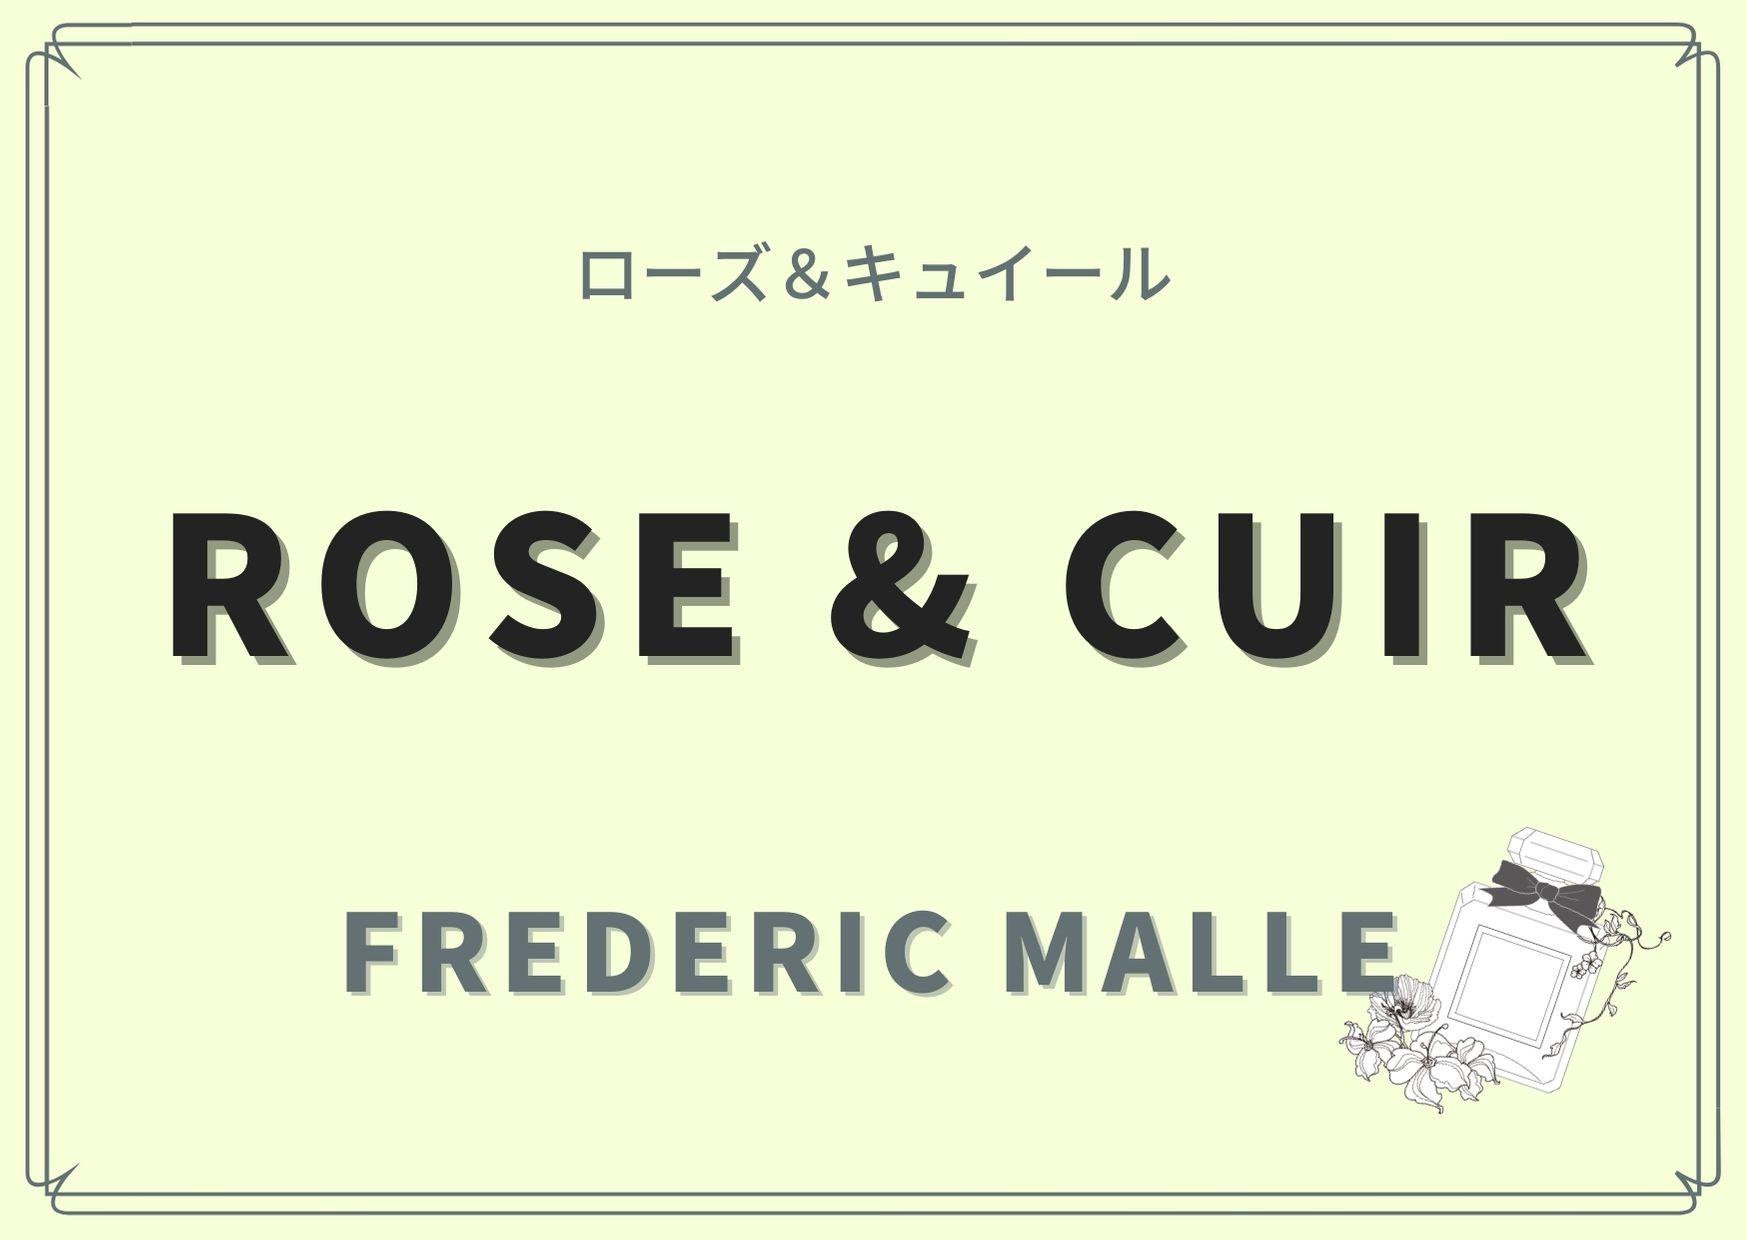 ROSE & CUIR(ローズ&キュイール)/FREDERIC MALLE(フレデリック マル)